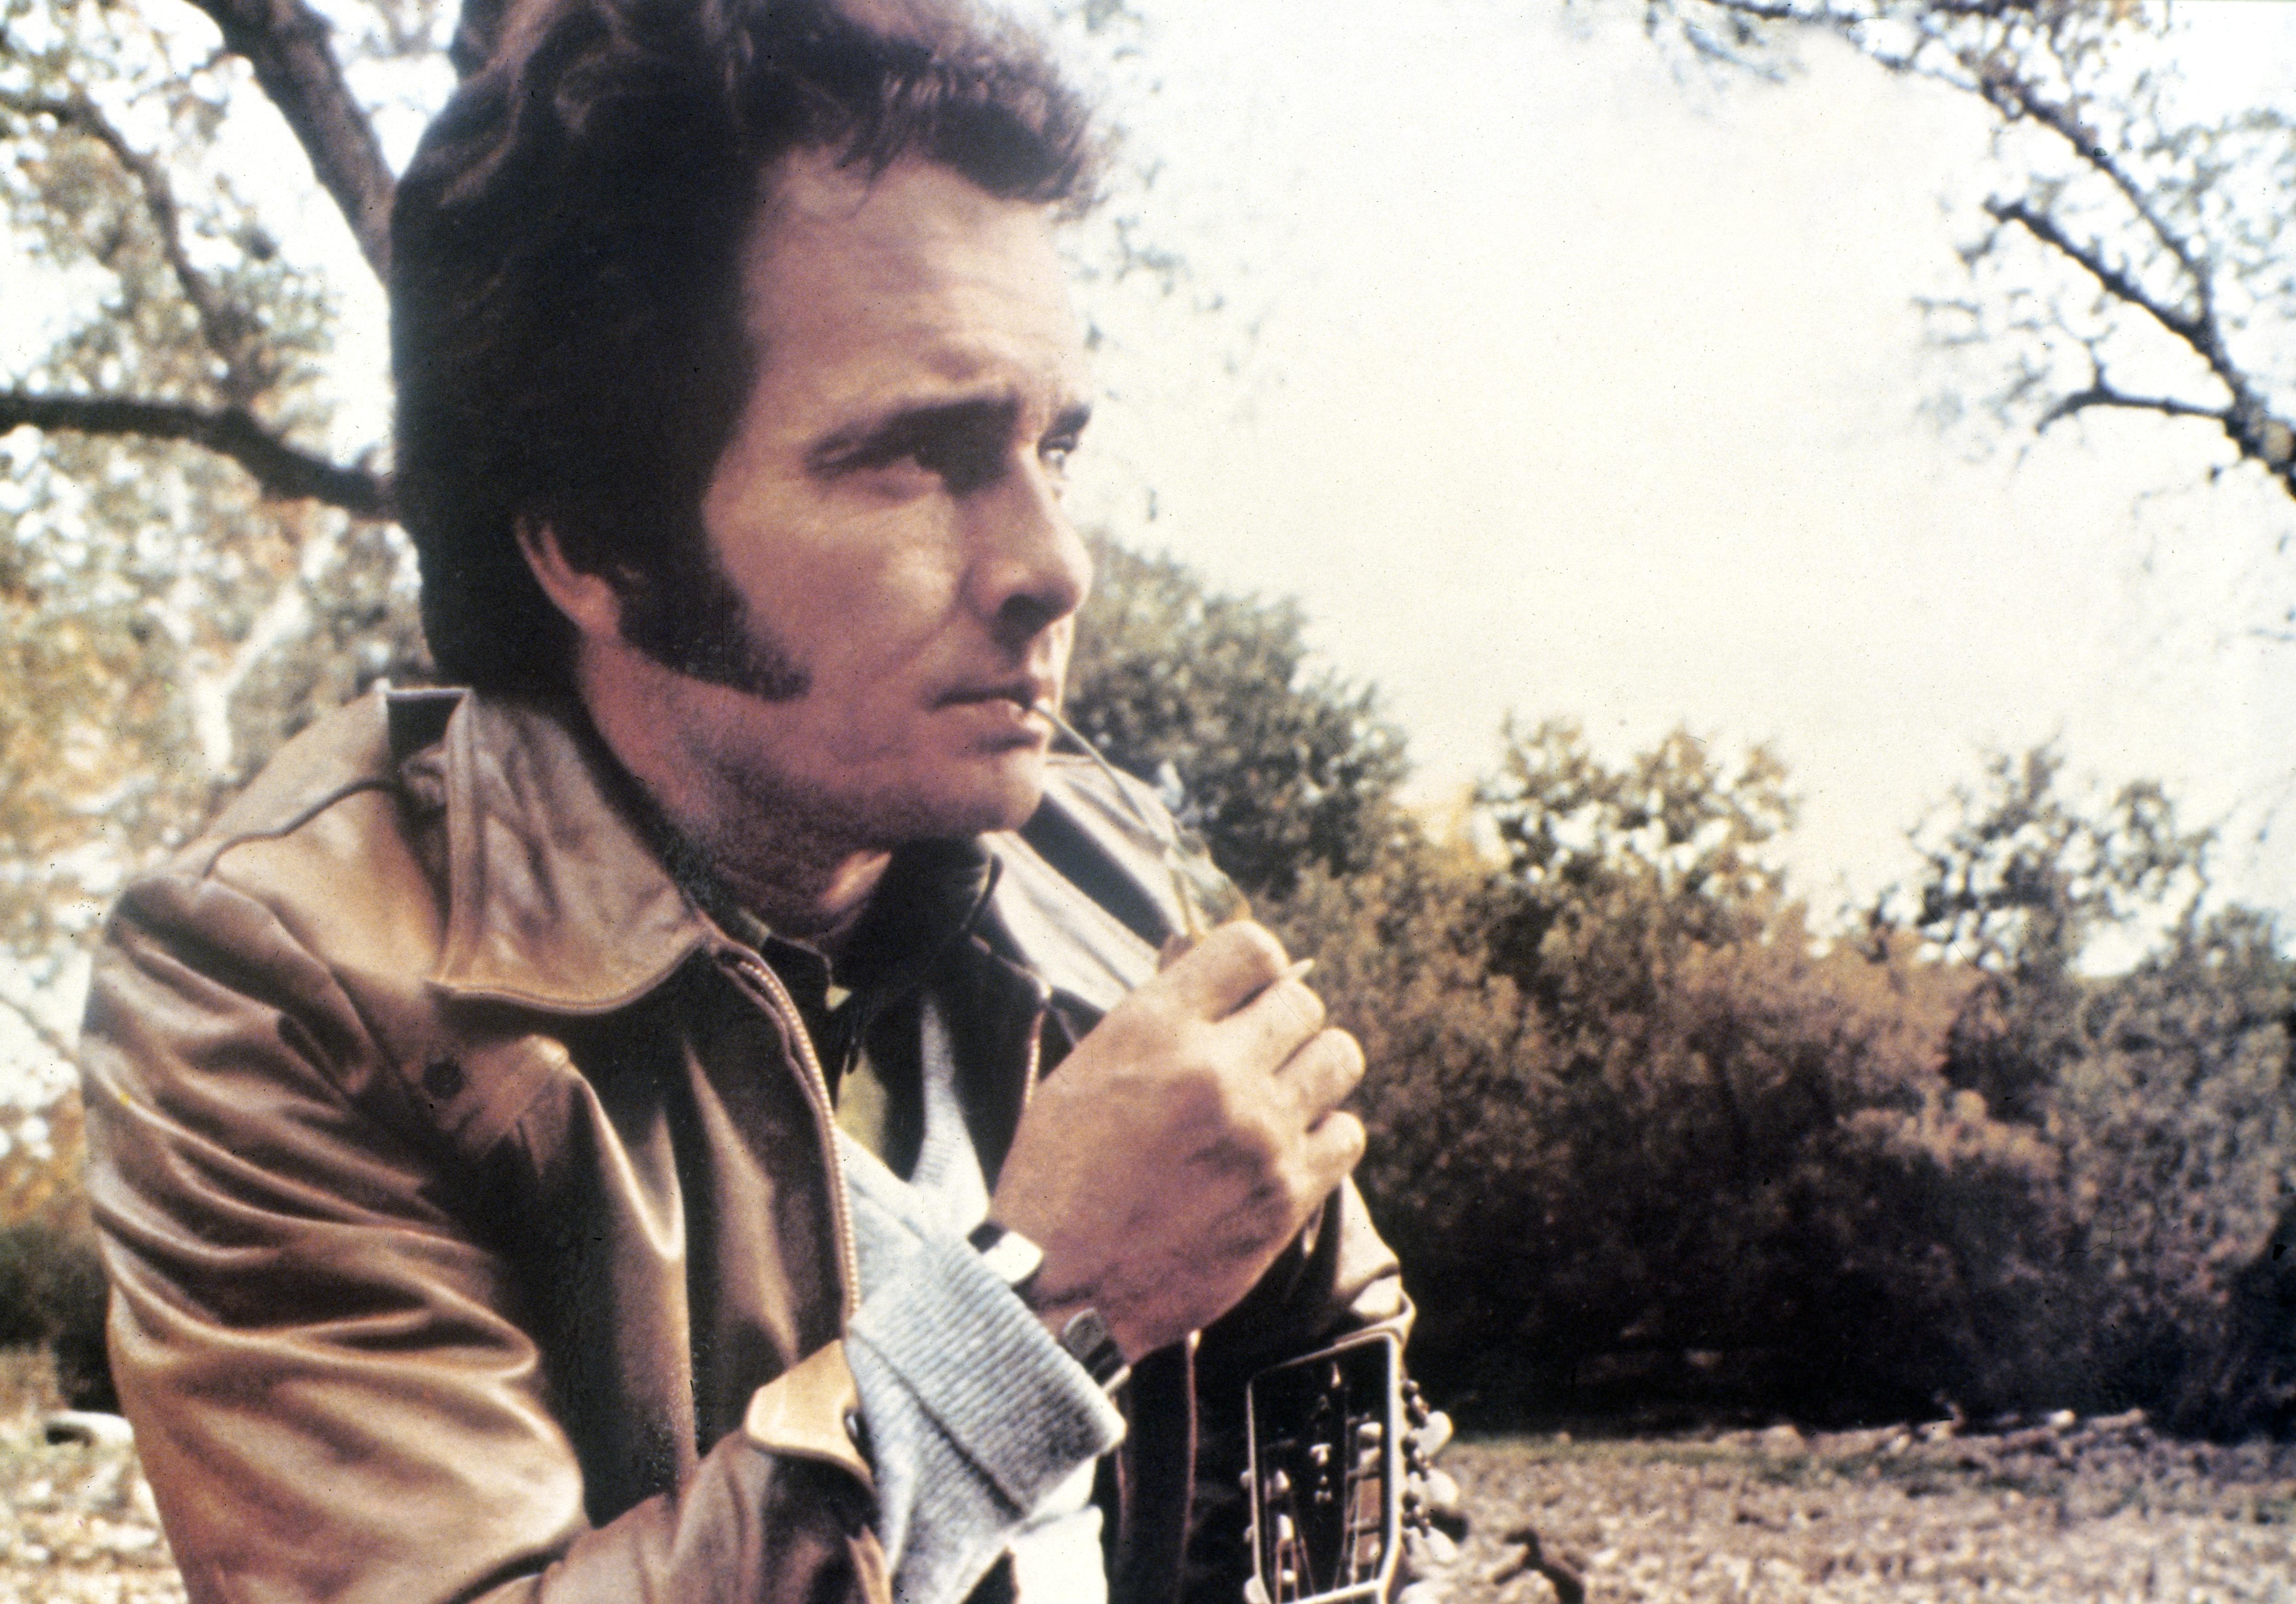 Merle Haggard - Unforgettable - Amazon.com Music